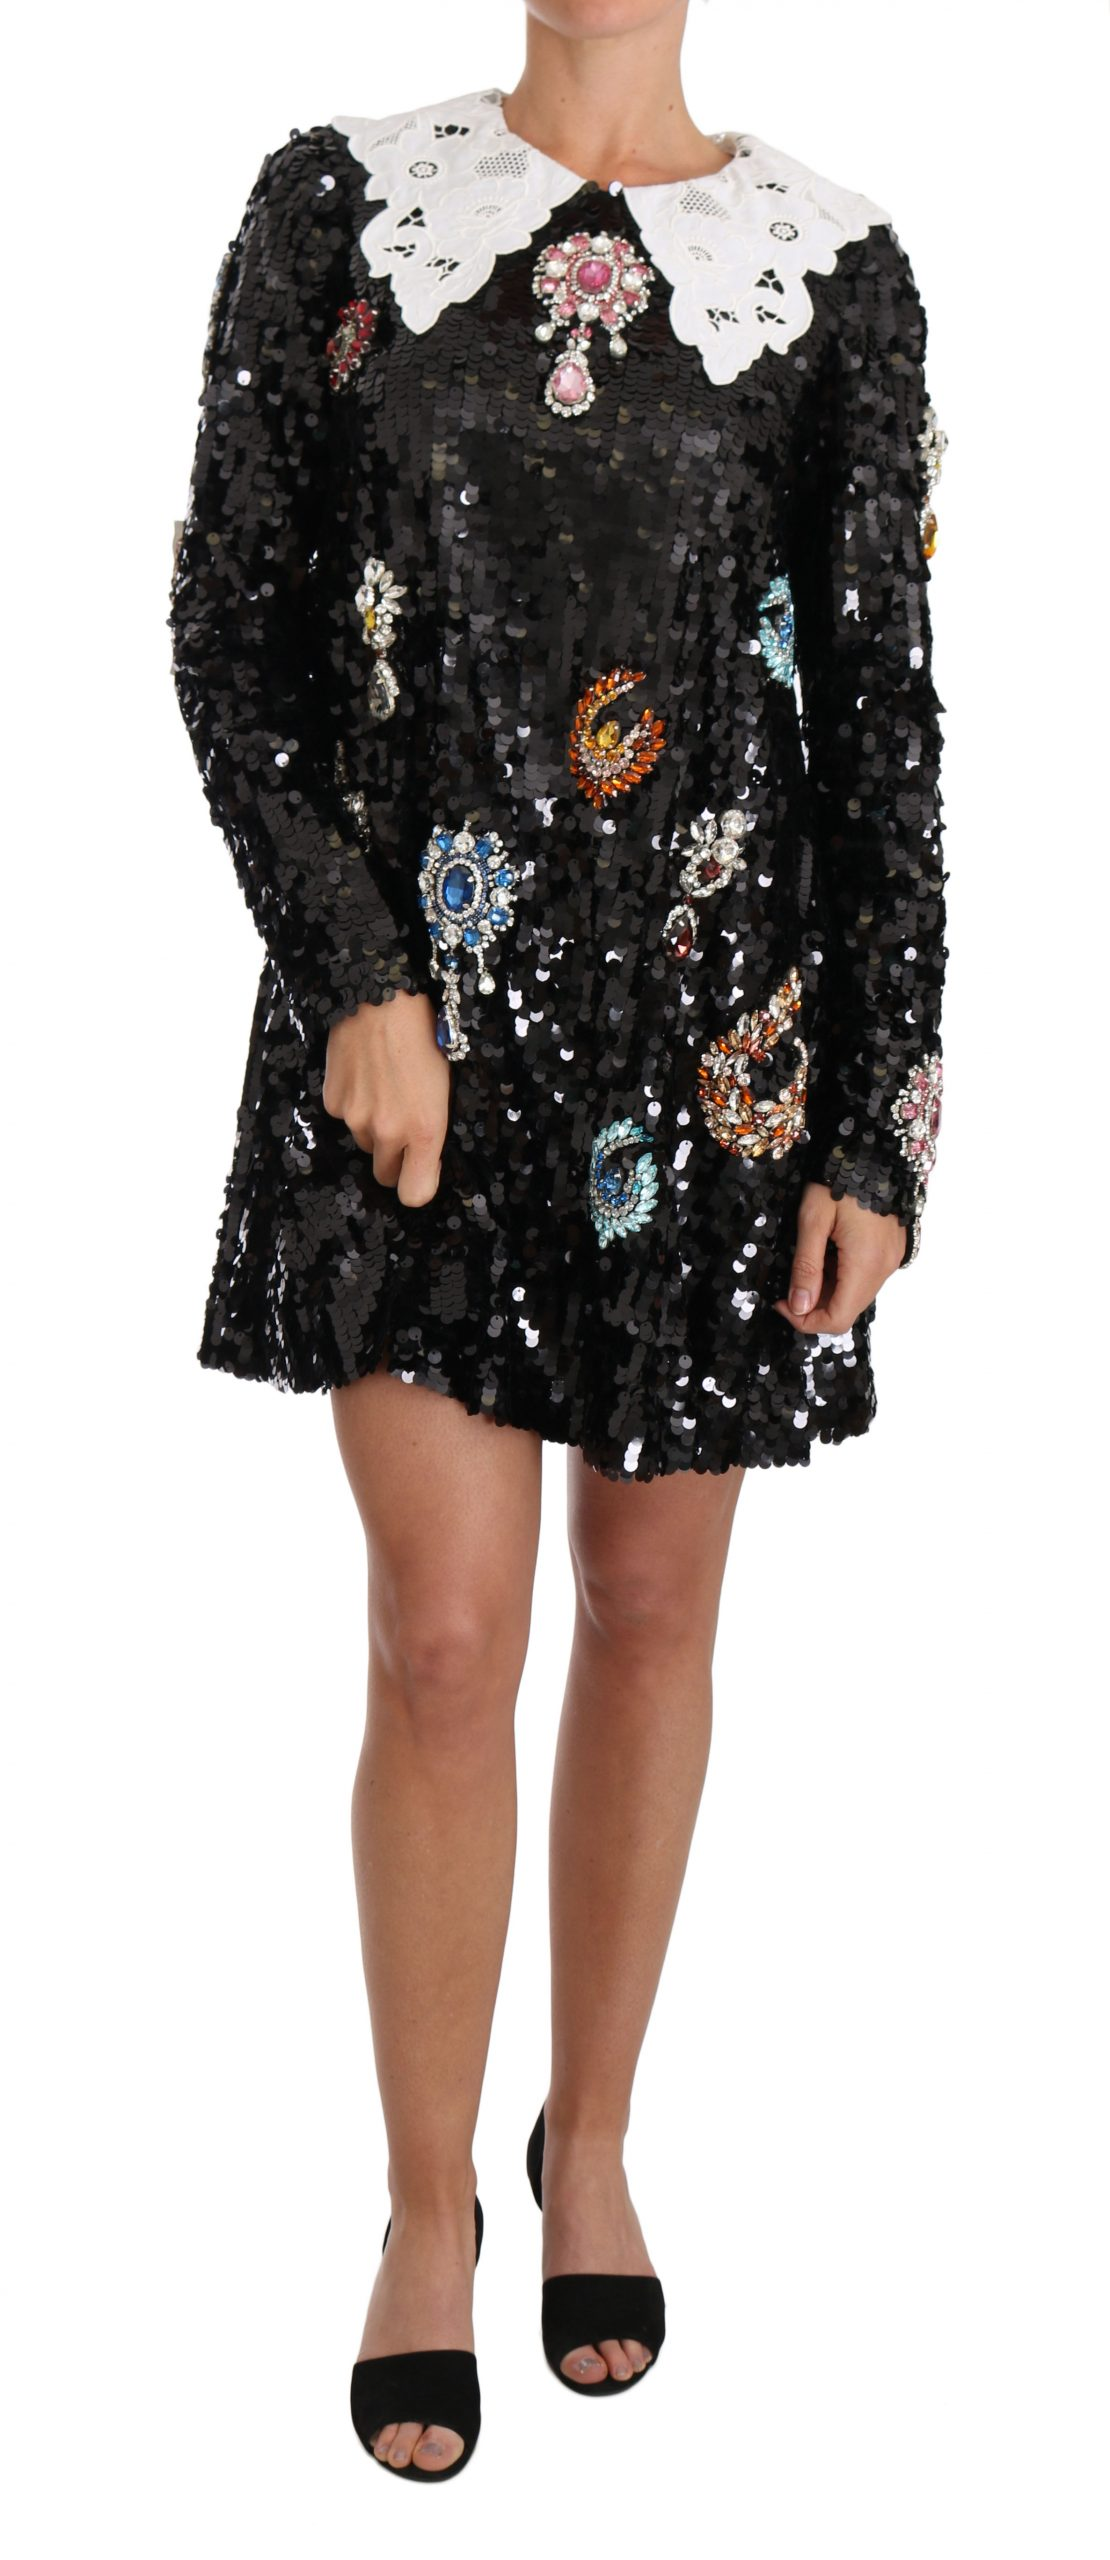 Dolce & Gabbana Women's Sequined Crystal Fairy Tale Dress Black DR1519 - IT40|S